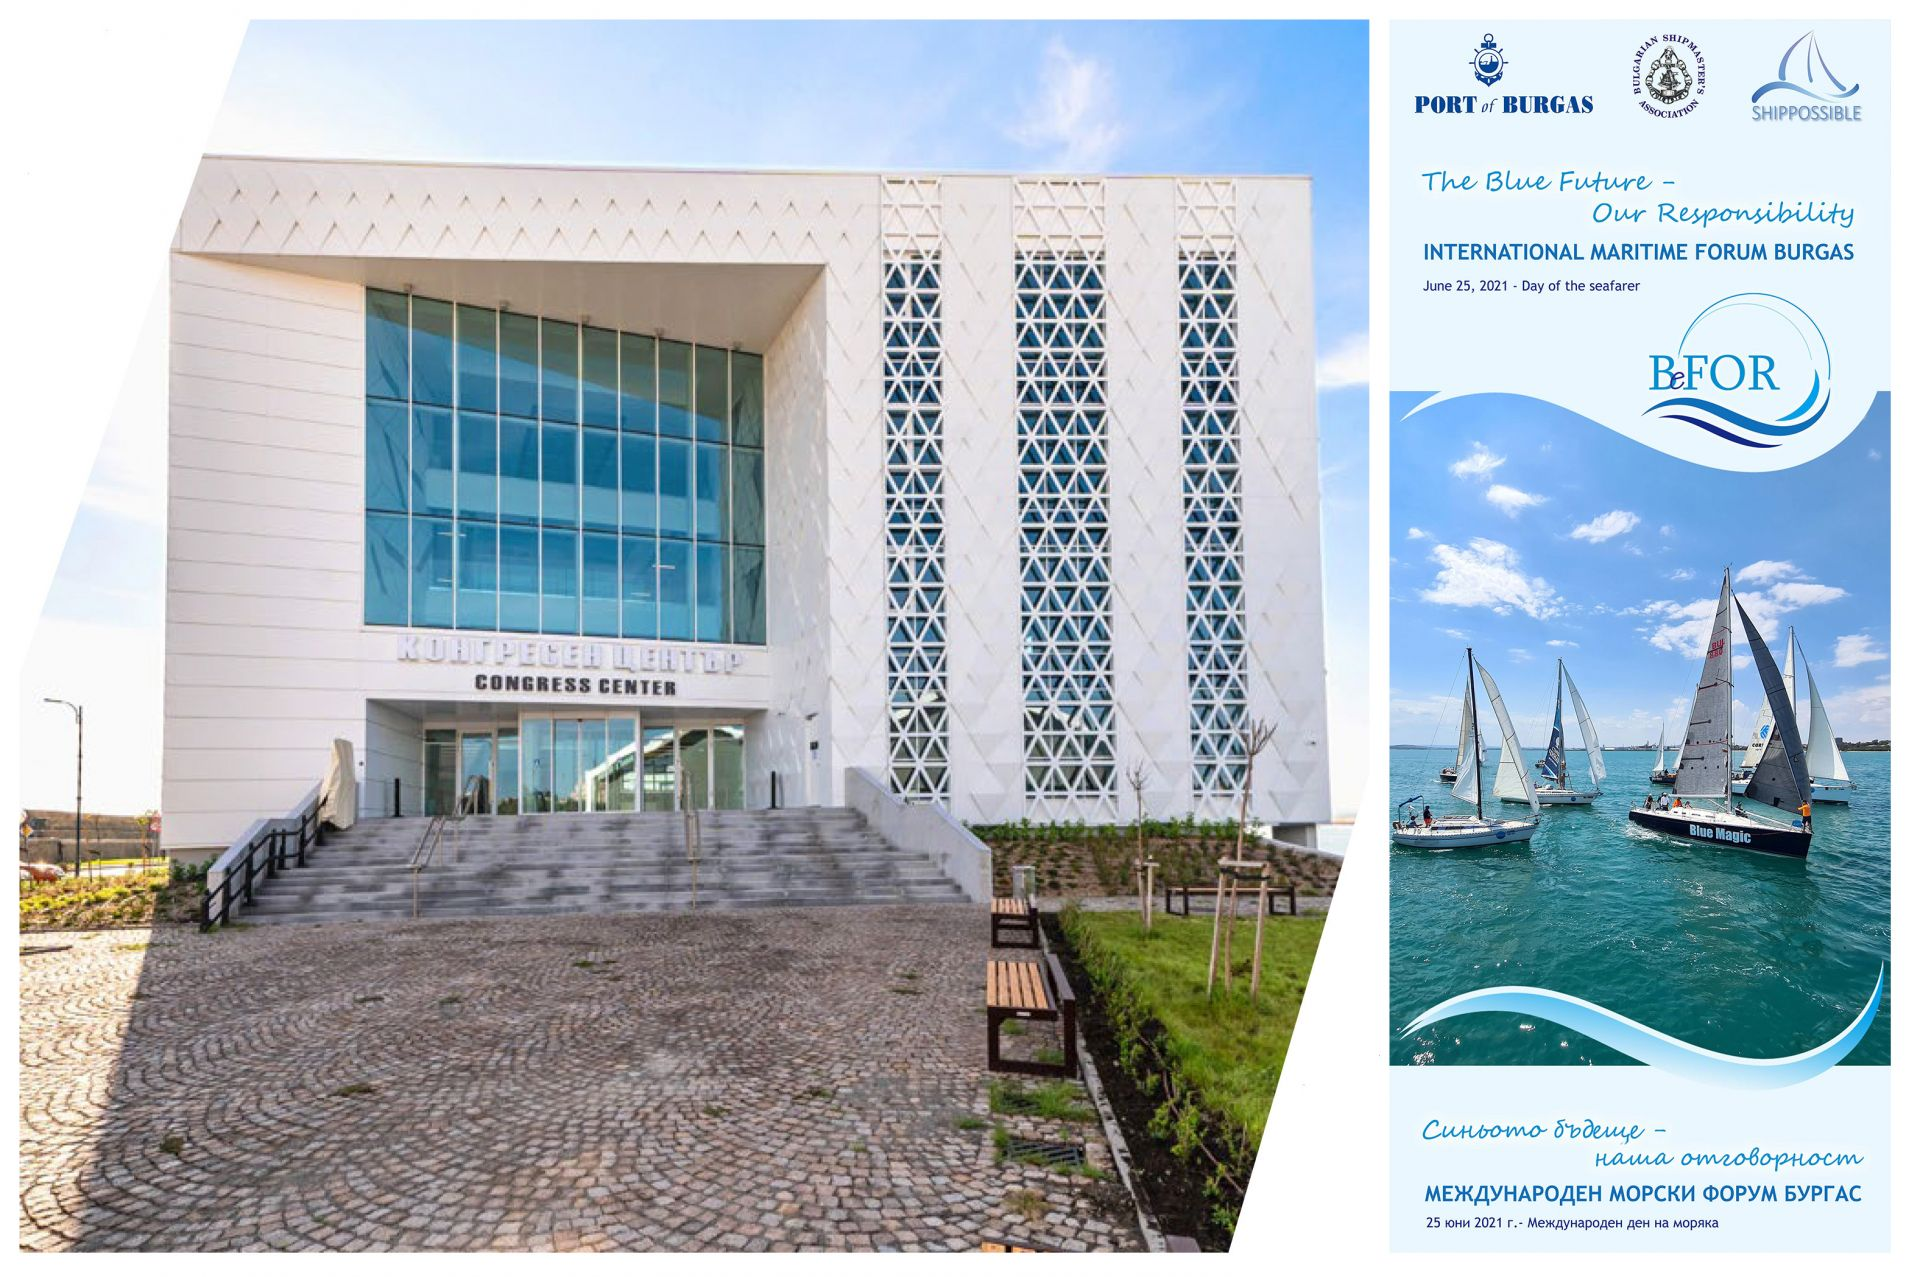 Пристанище Бургас ще бъде домакин на Международен морски форум - 18.06.2021